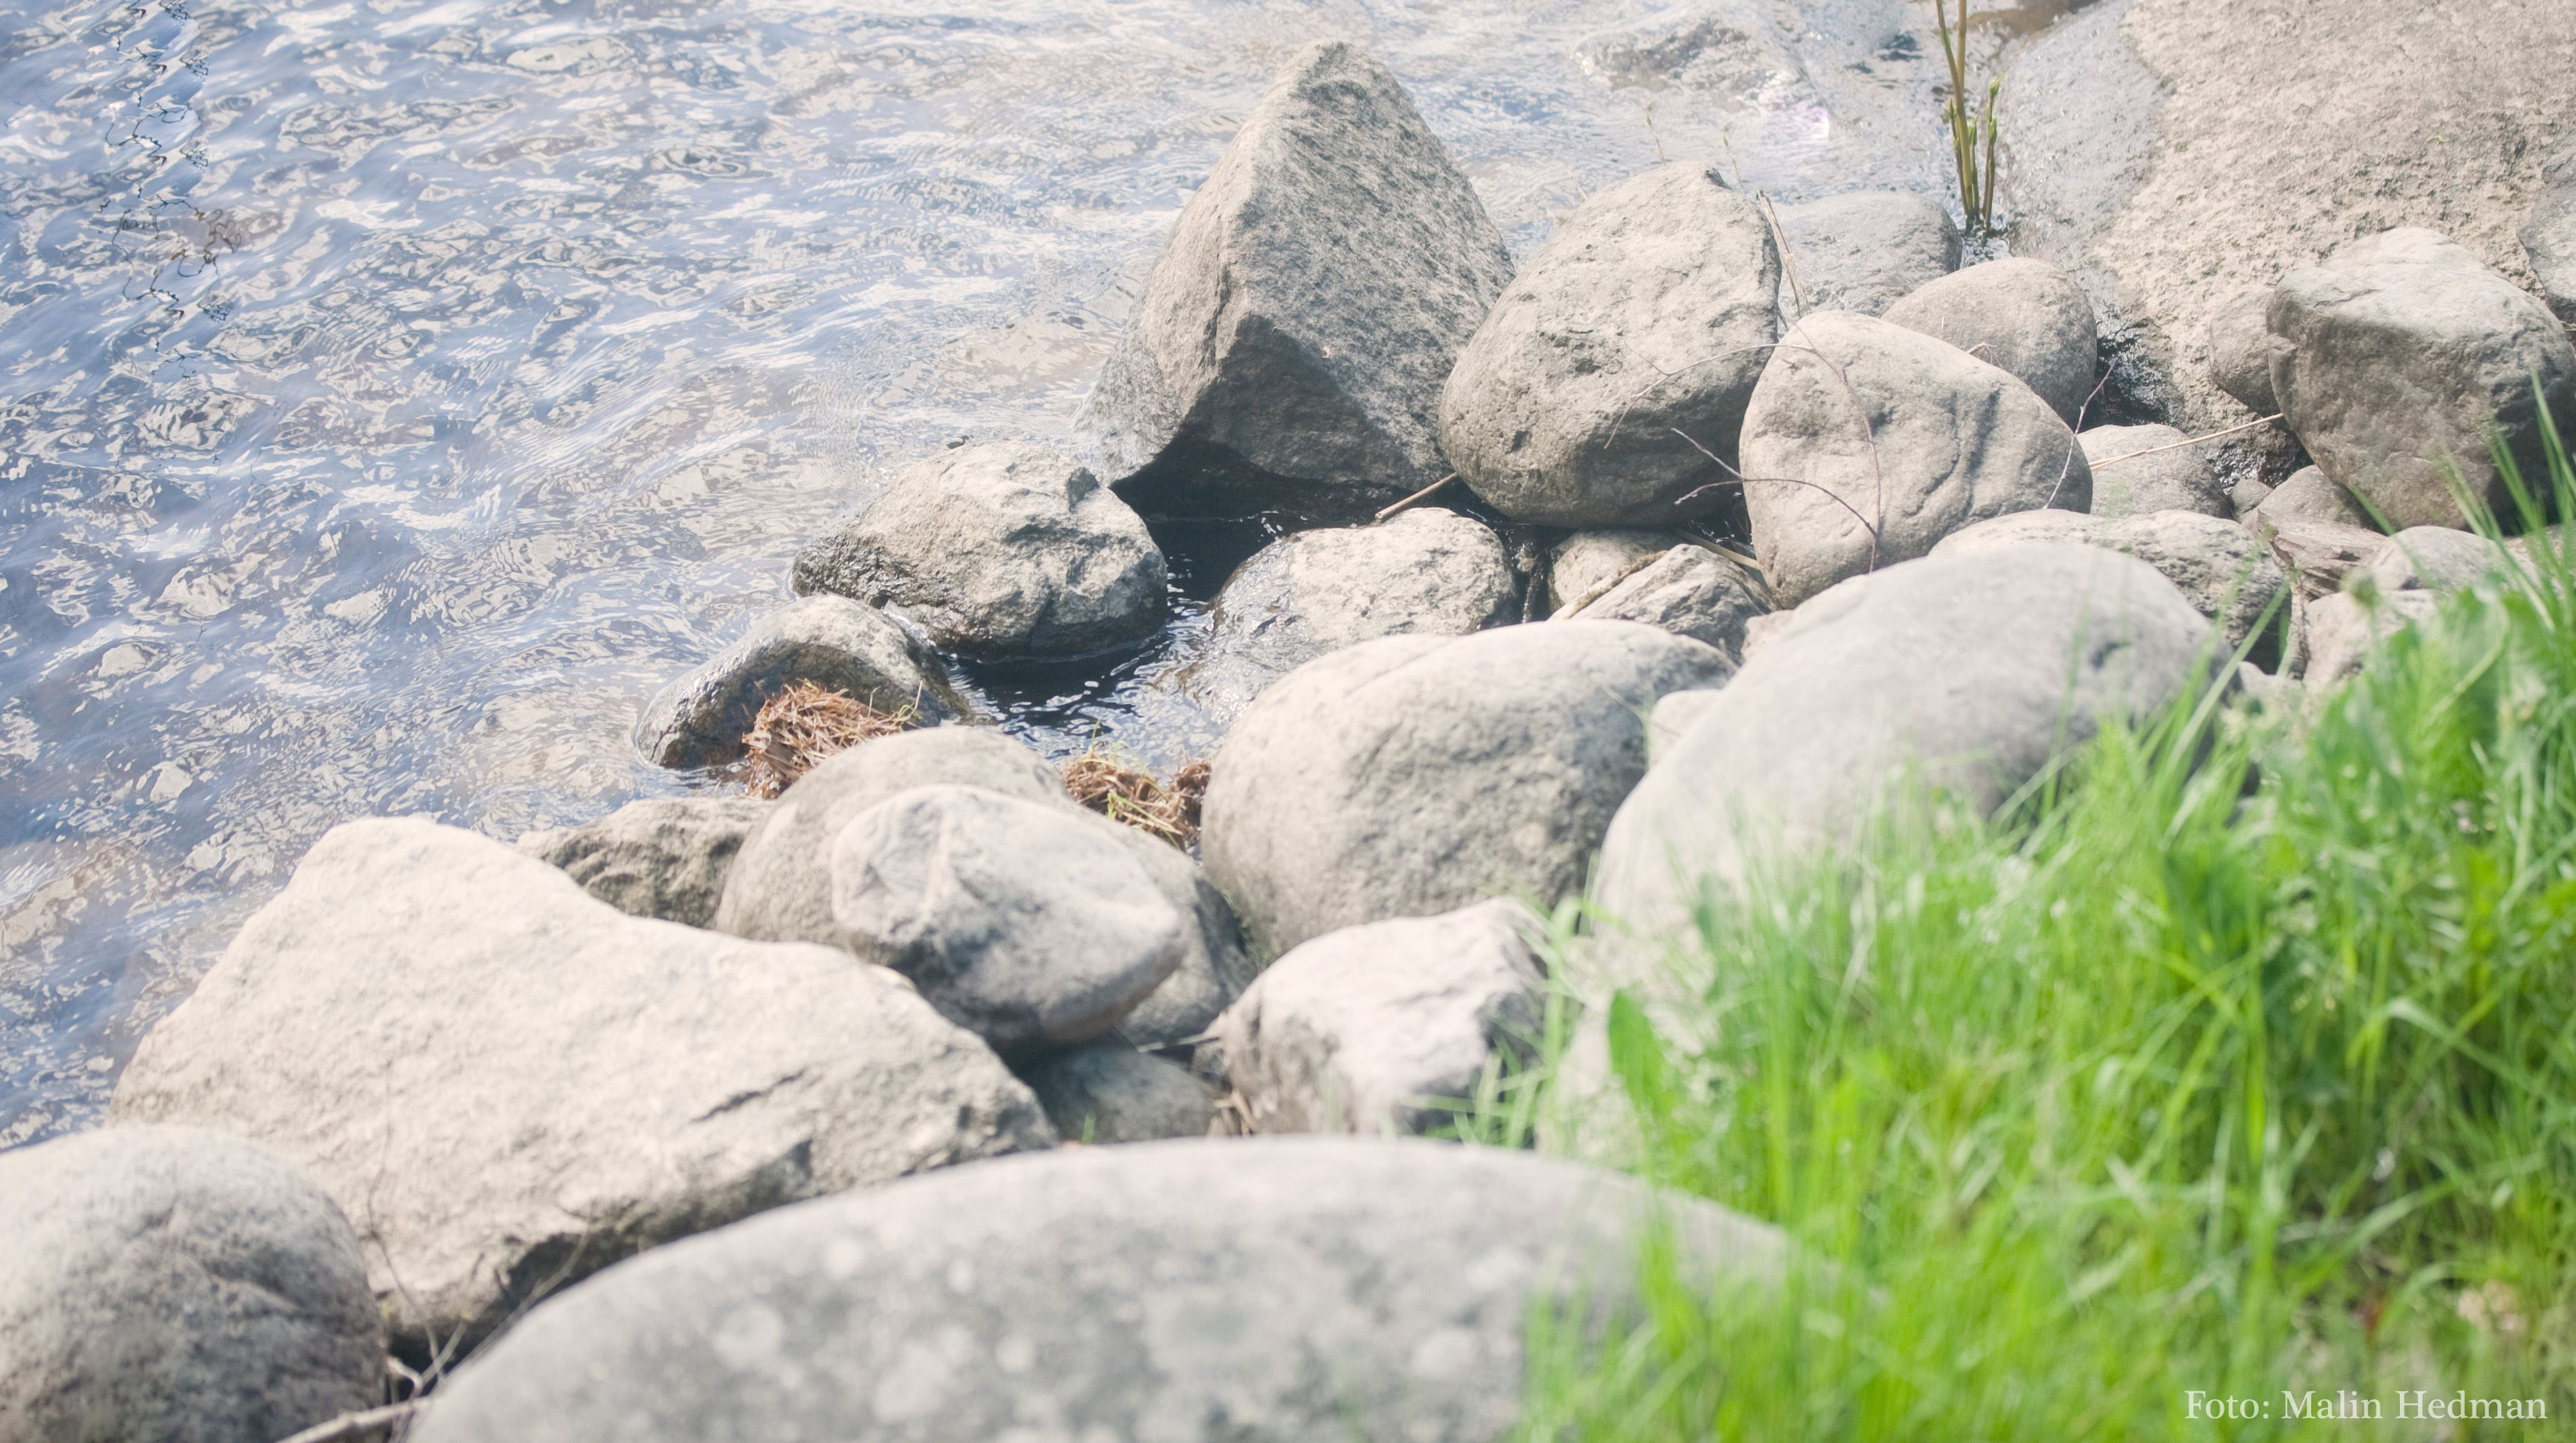 Malin Hedman,  © Malå kommun, Strandgårdskväll